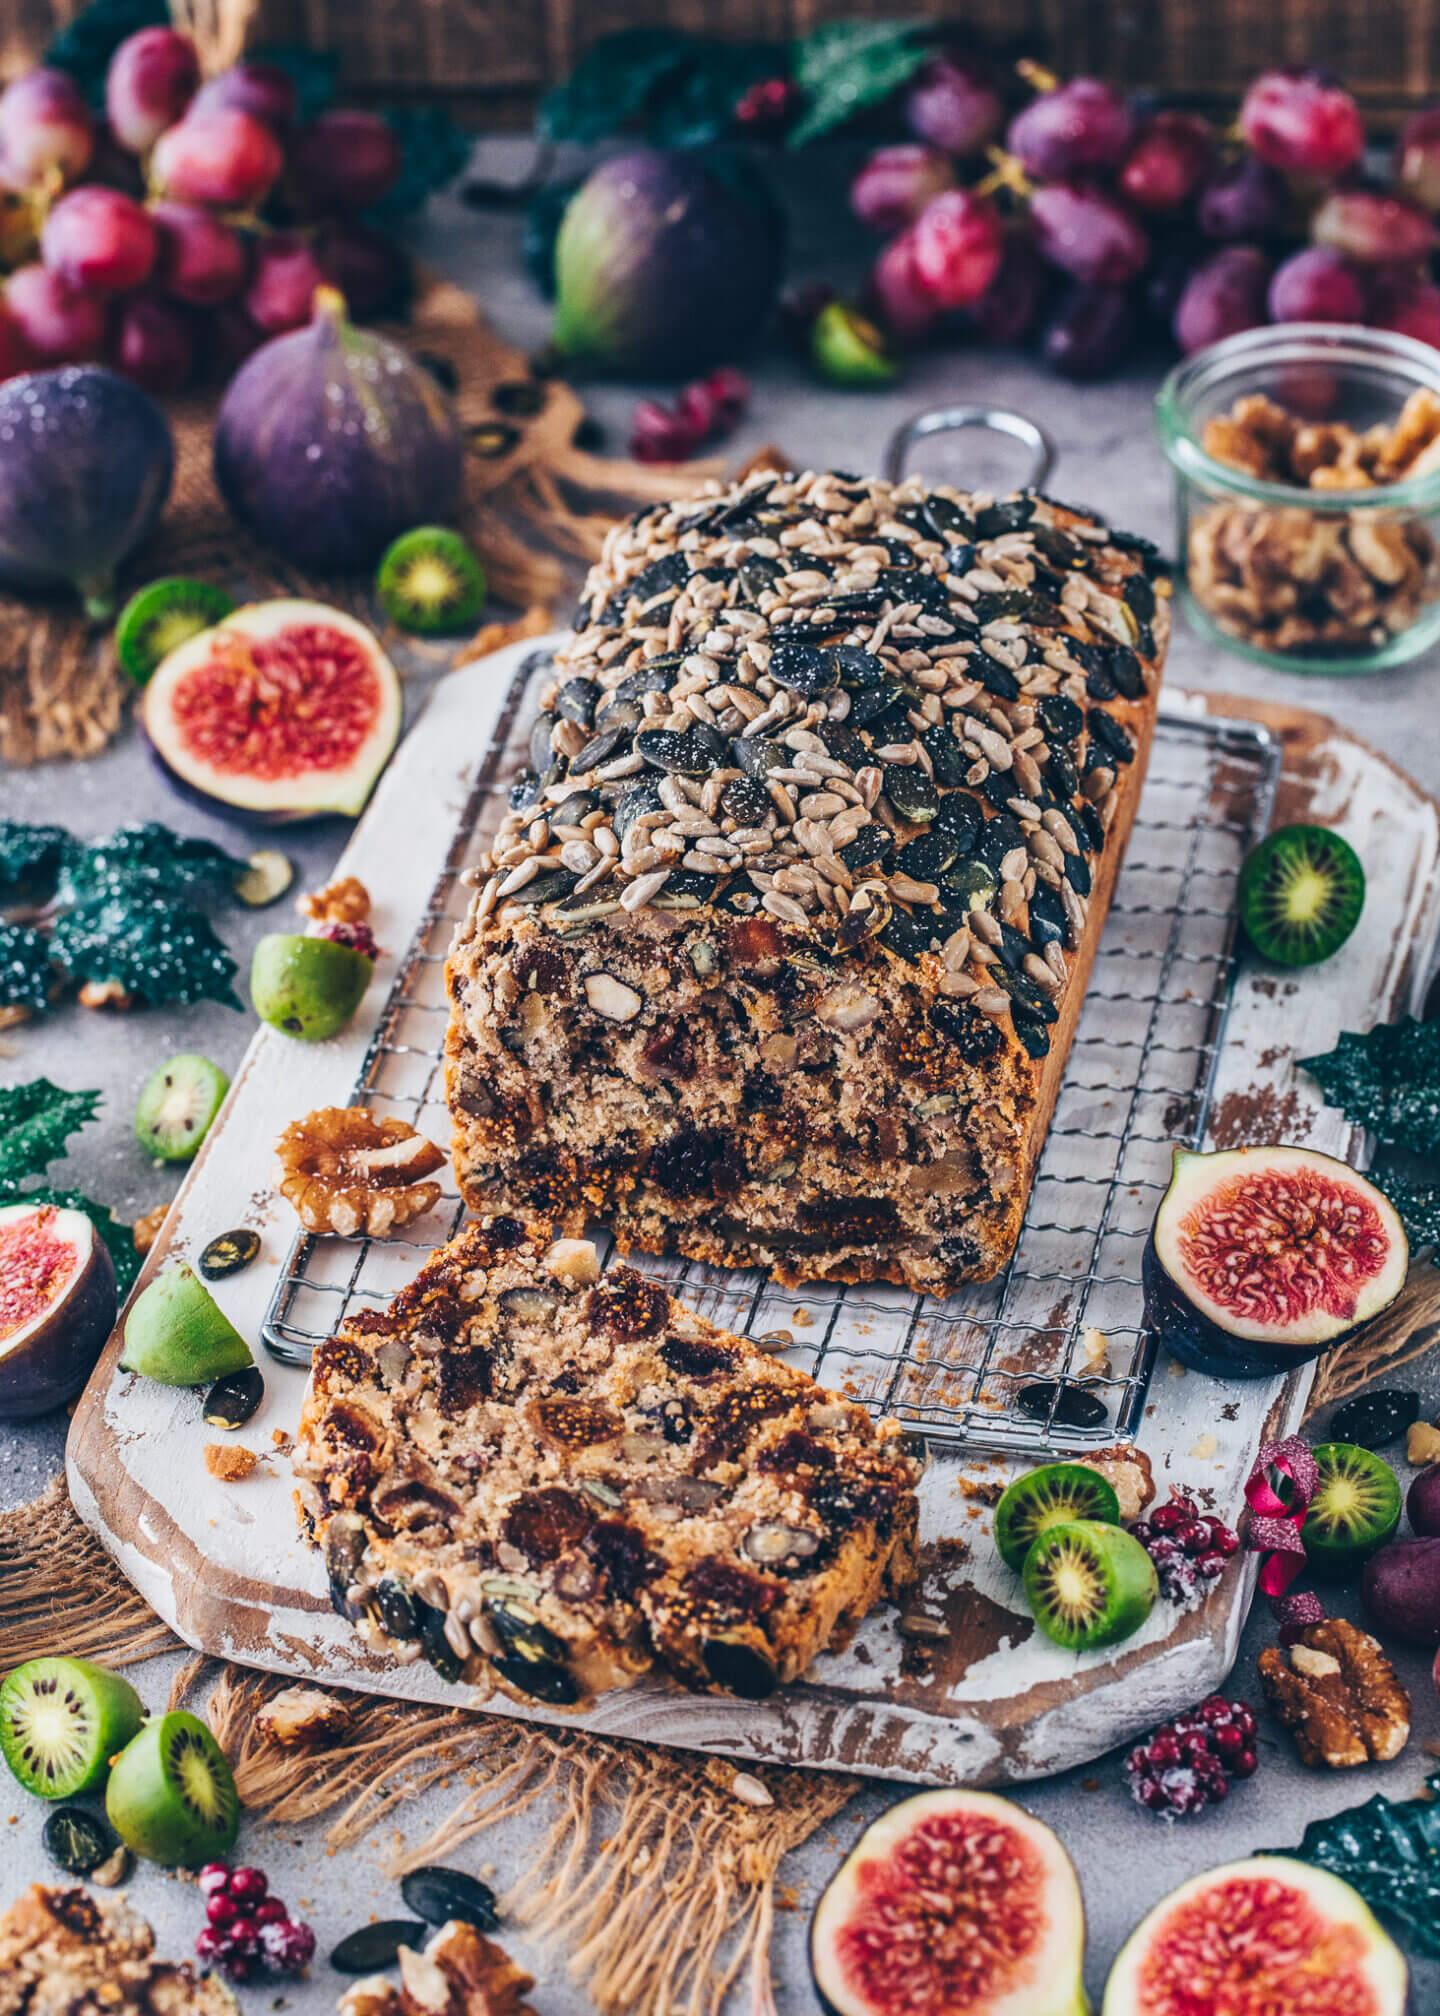 Vegan Fruit and Nut Bread